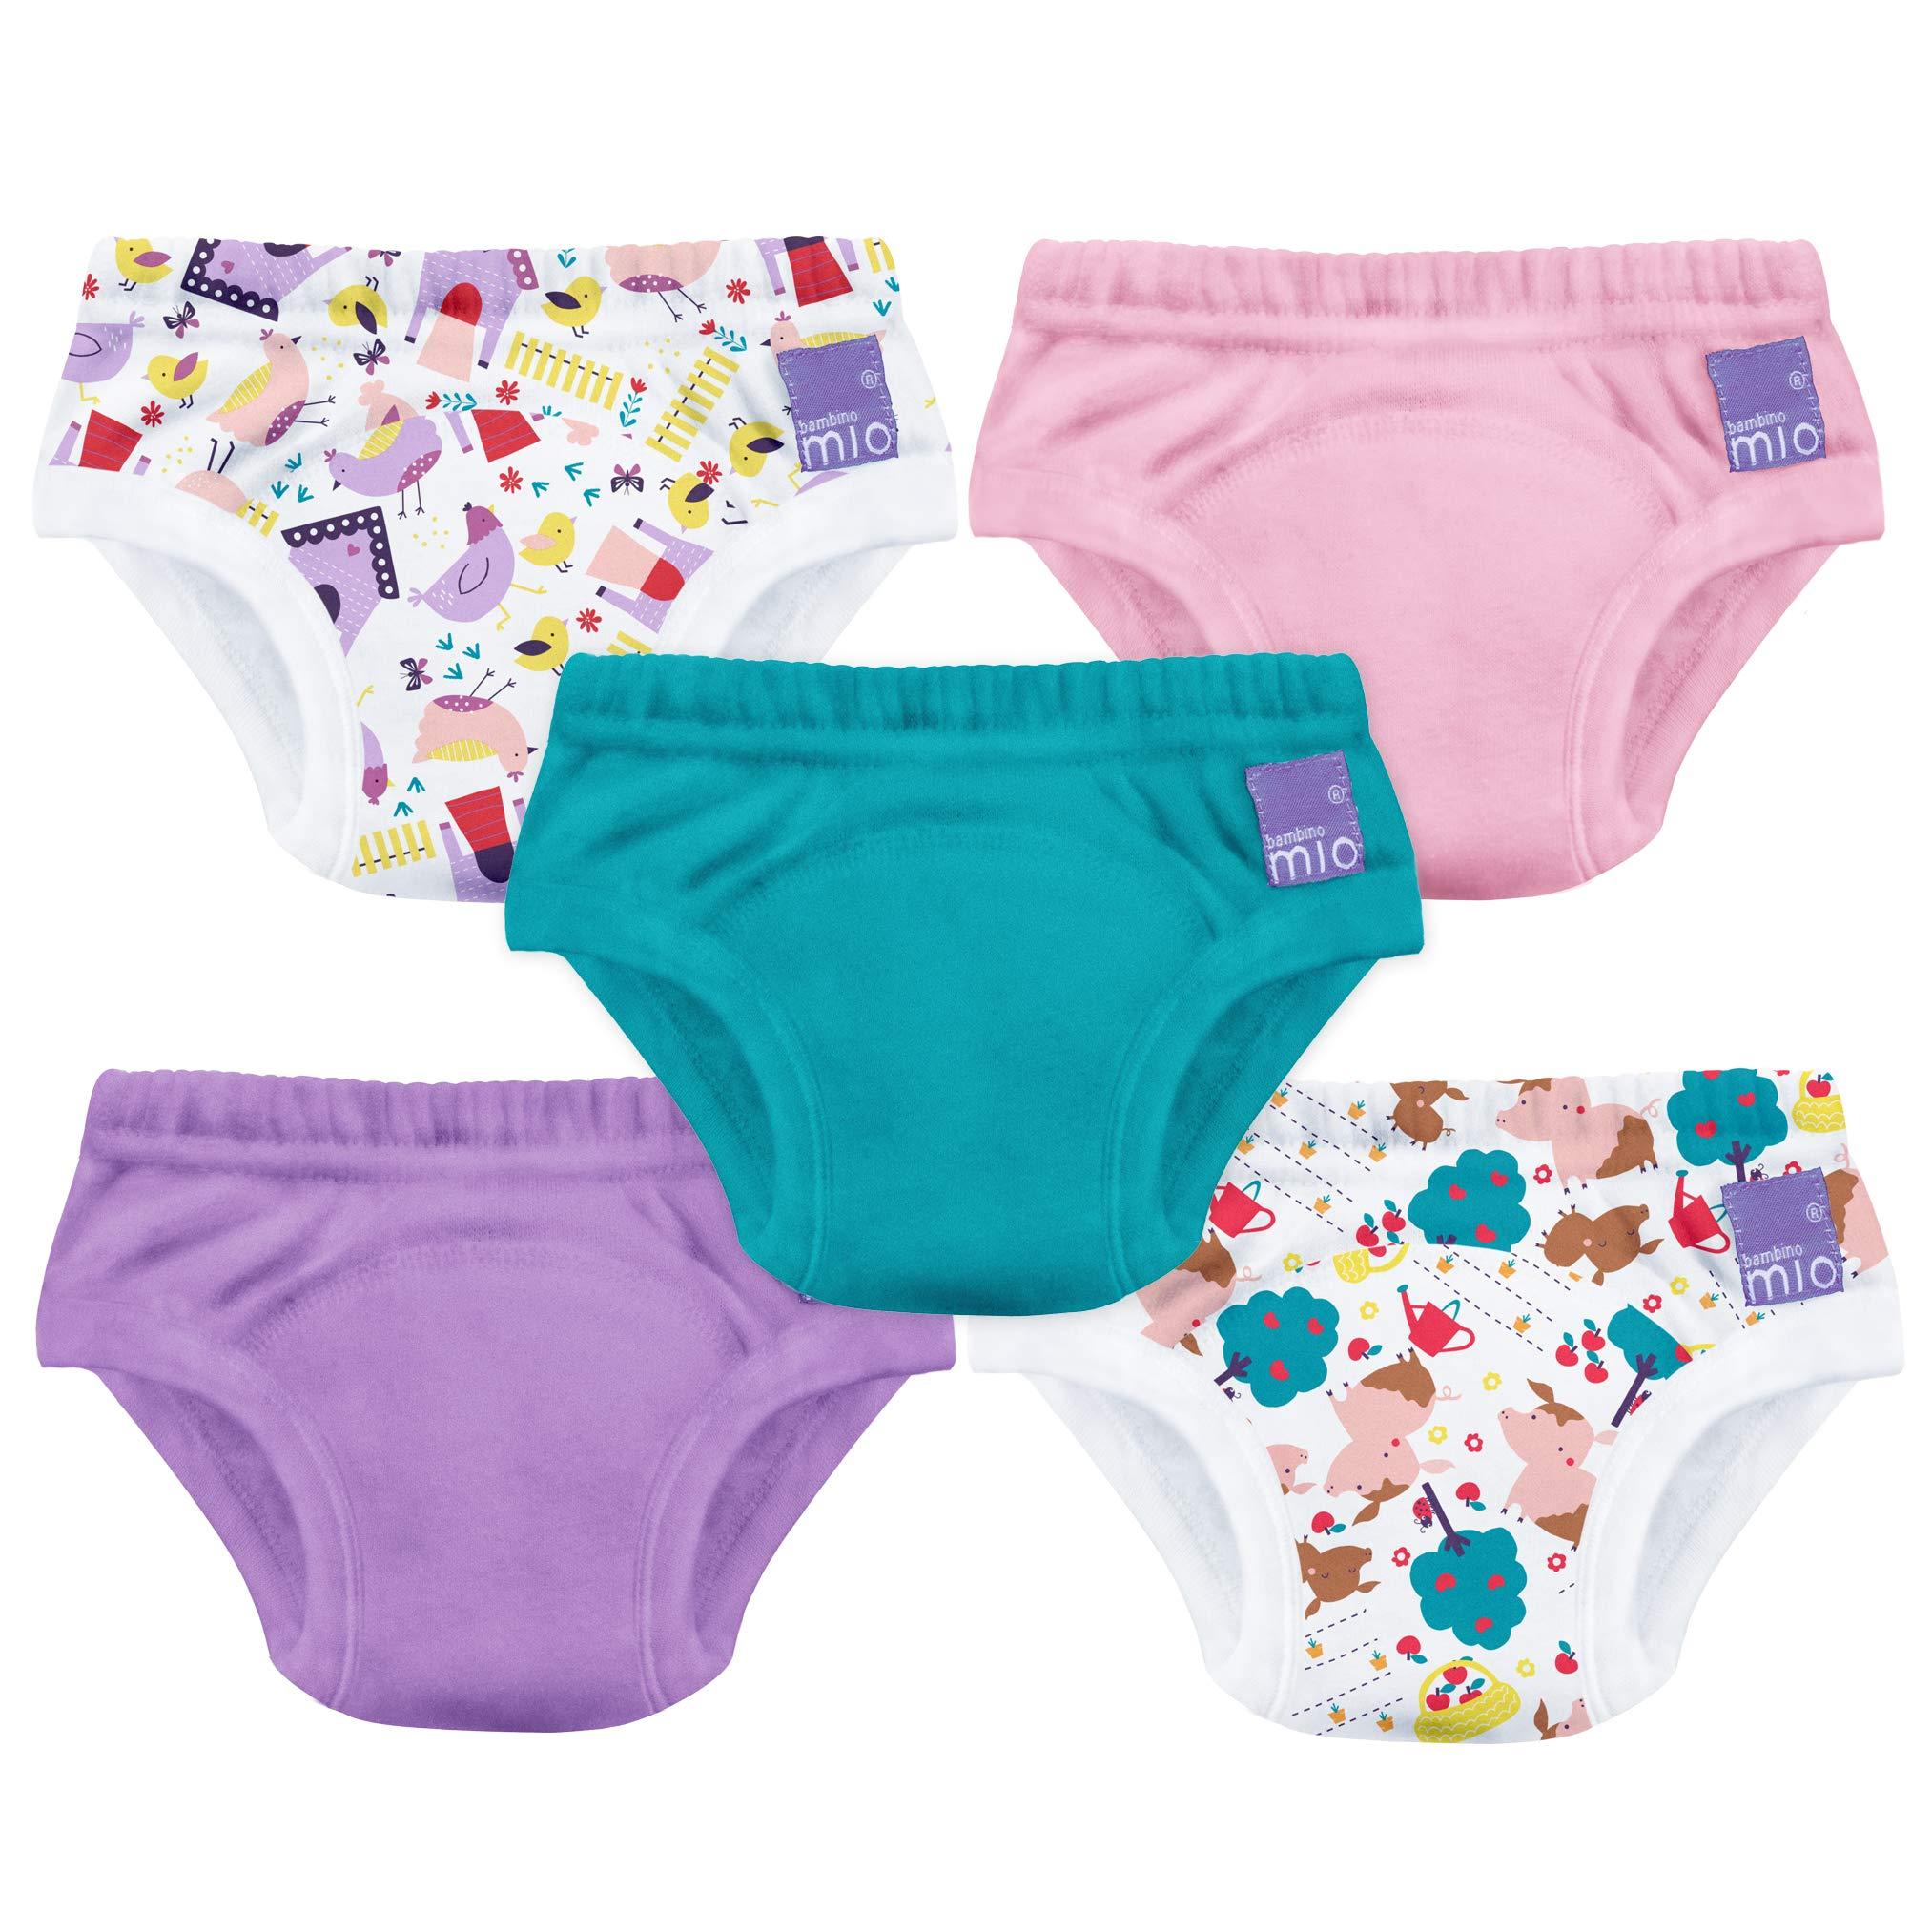 Lictin Underwear Potty Training Pants,7pcs Reusable Kids Potty Training Pants Triple-Layer Training Pants Cute Design Unisex for Baby 1.5-2 Years with 1pcs Reusable Diaper